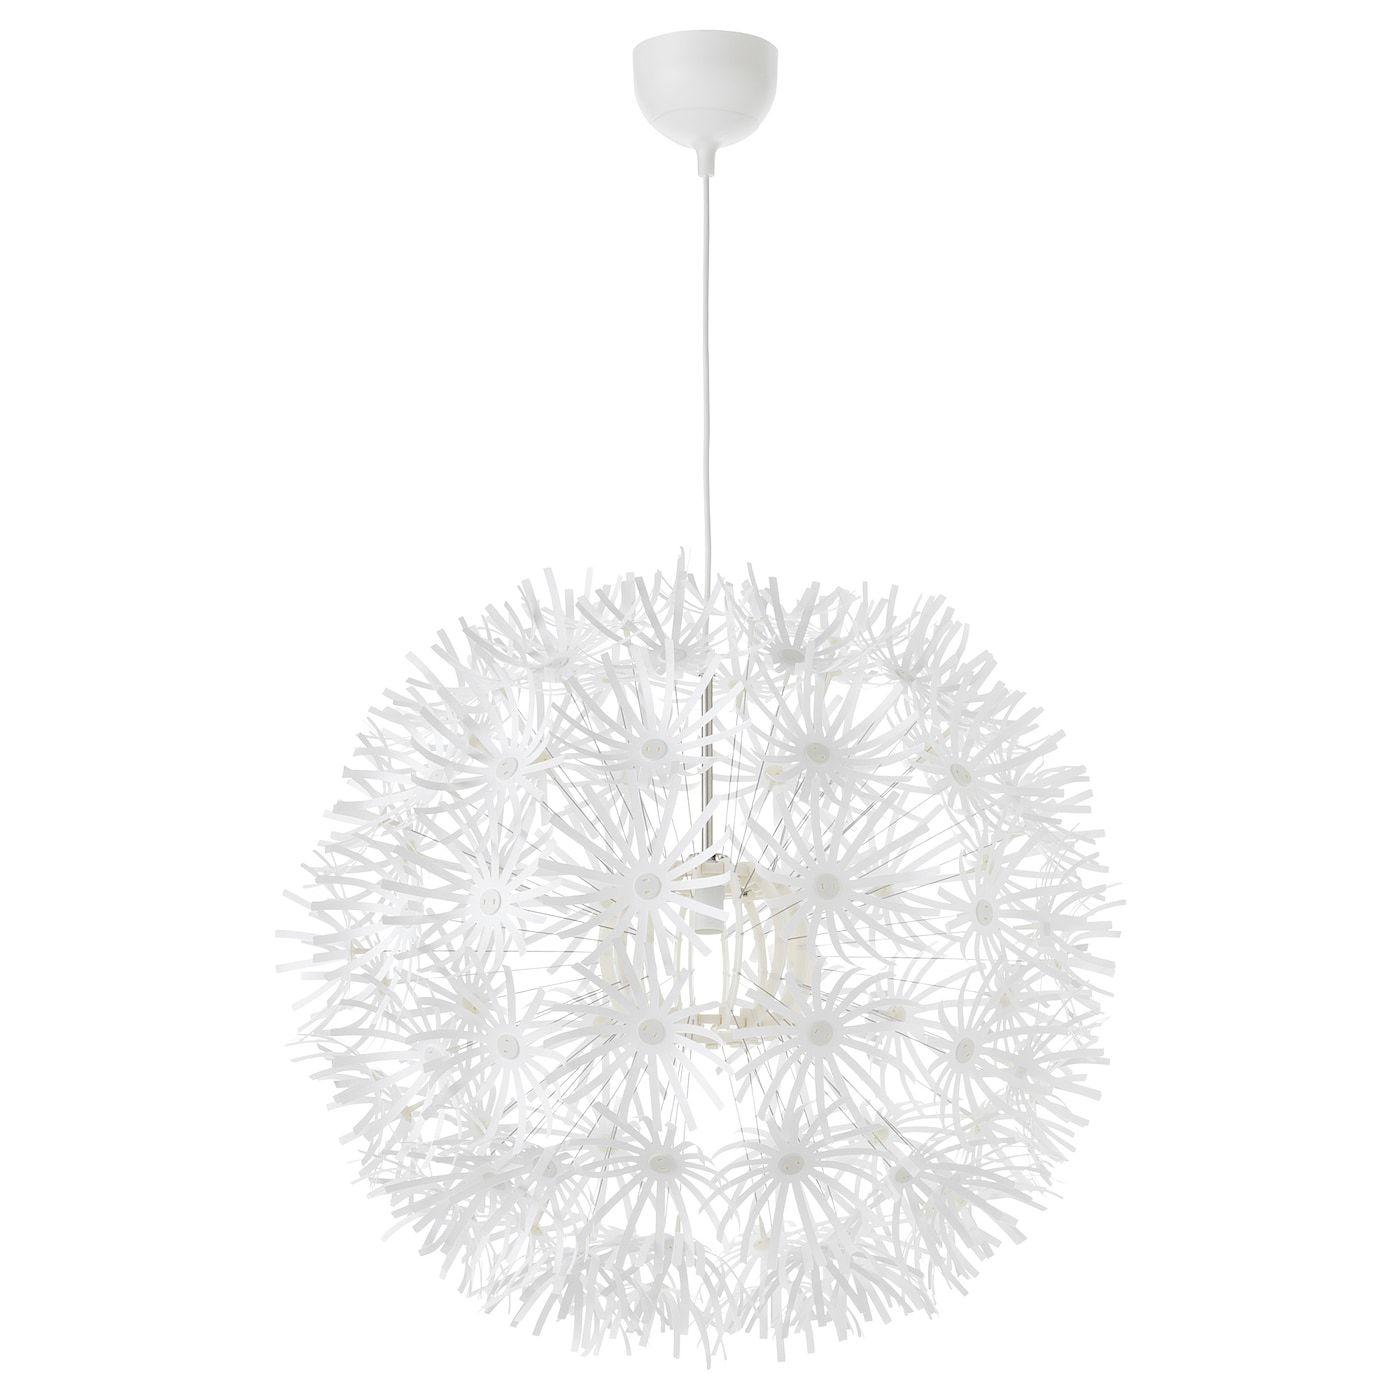 Ikea Maskros Lampa Wisząca Interiors